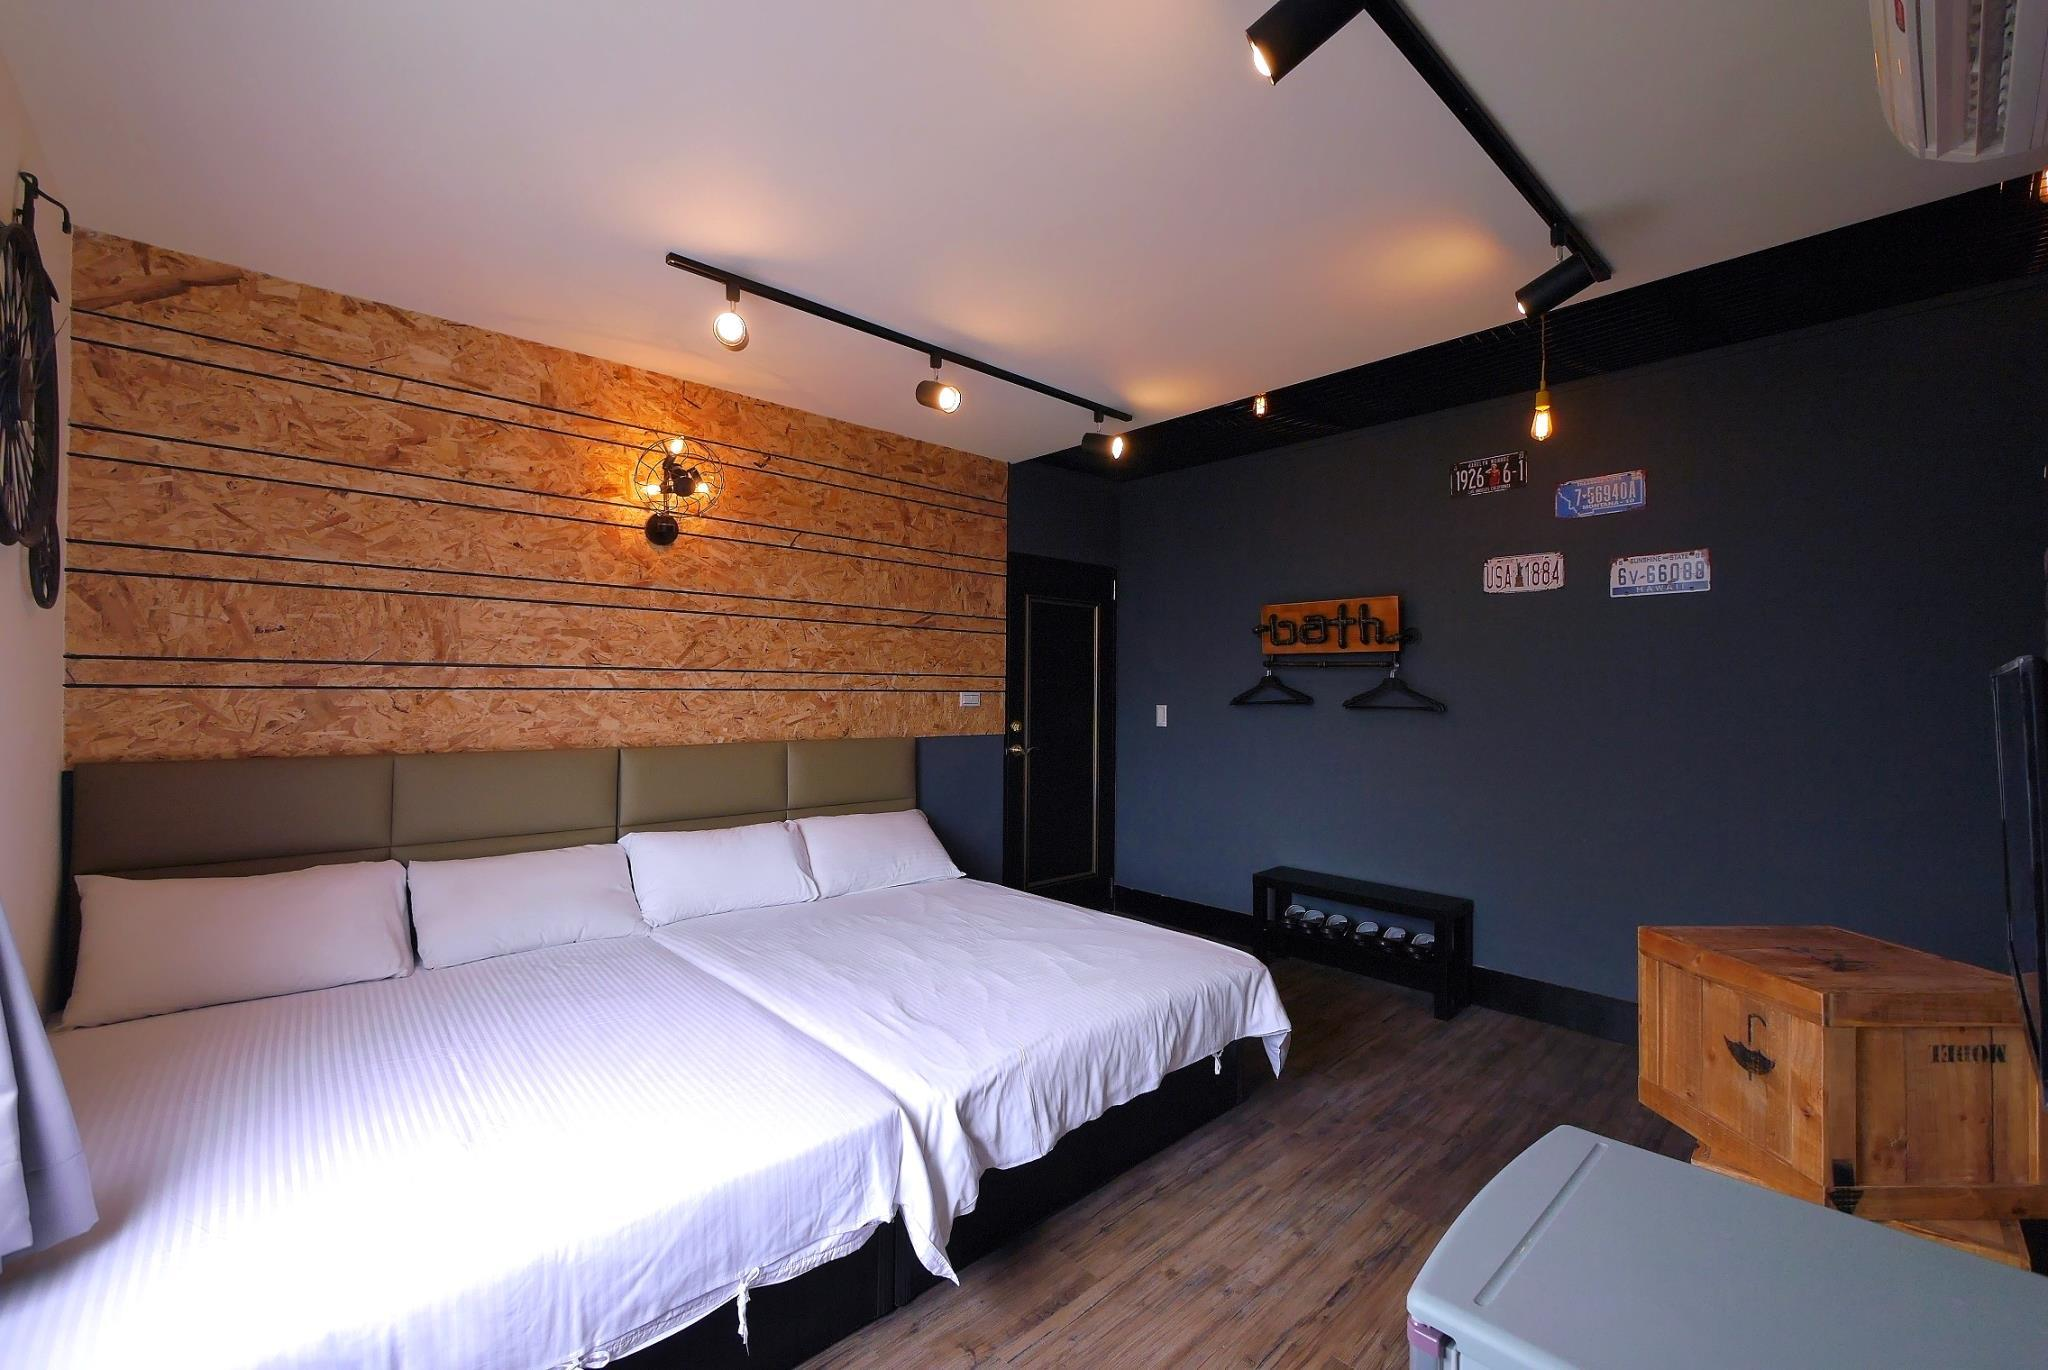 JJ House 10 Pax Room 301